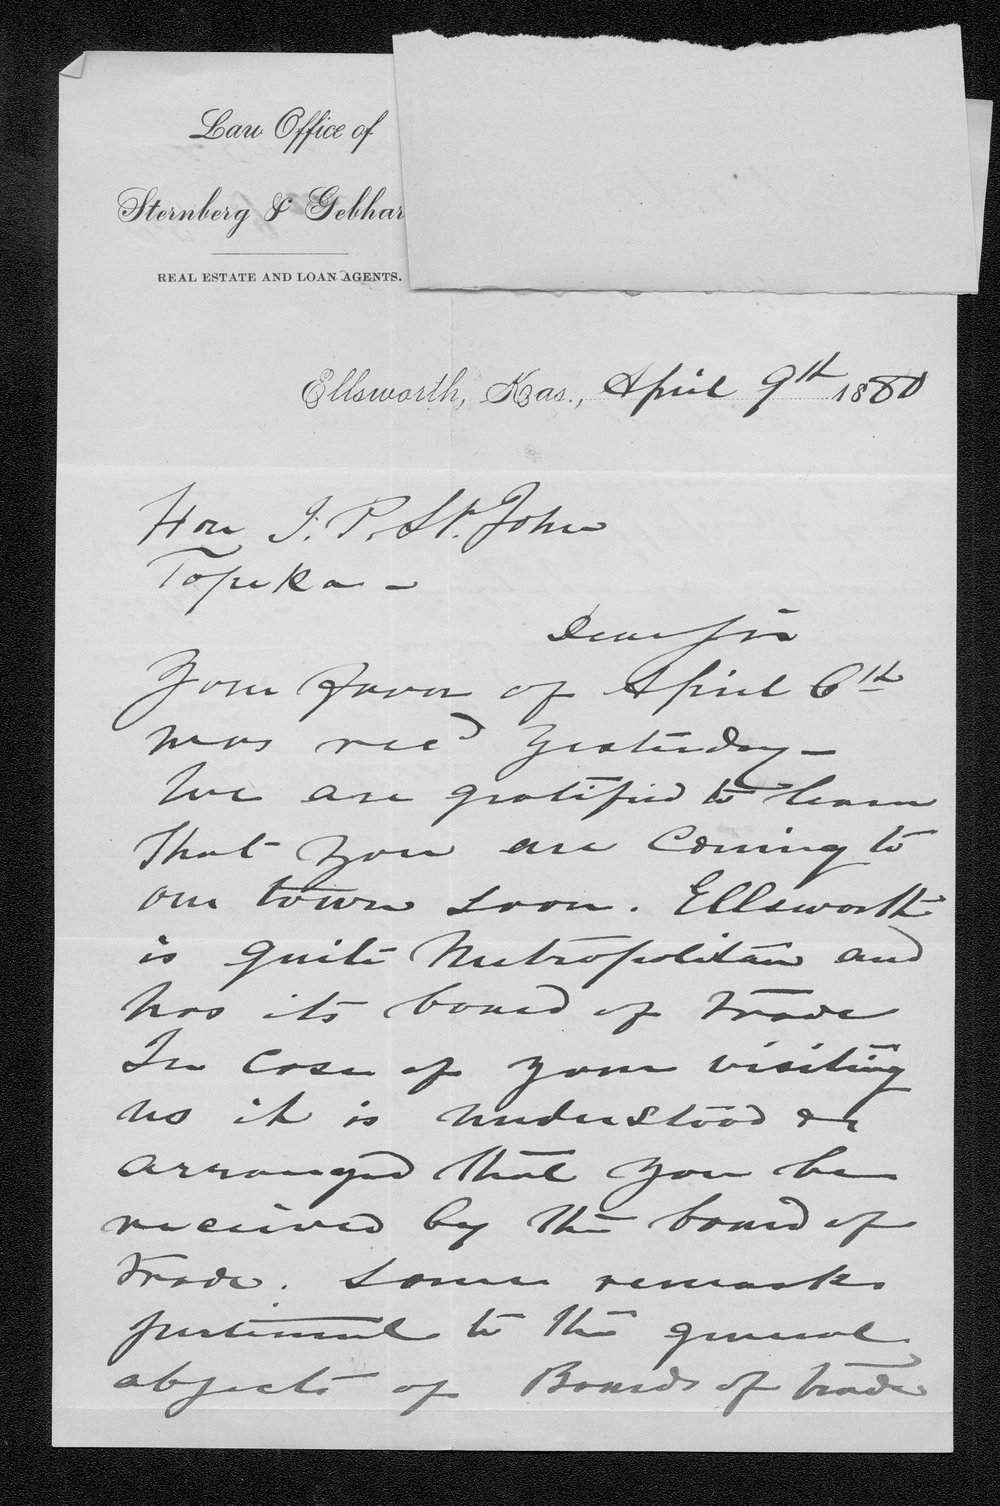 Theodore Sternberg to Governor John St. John - 1